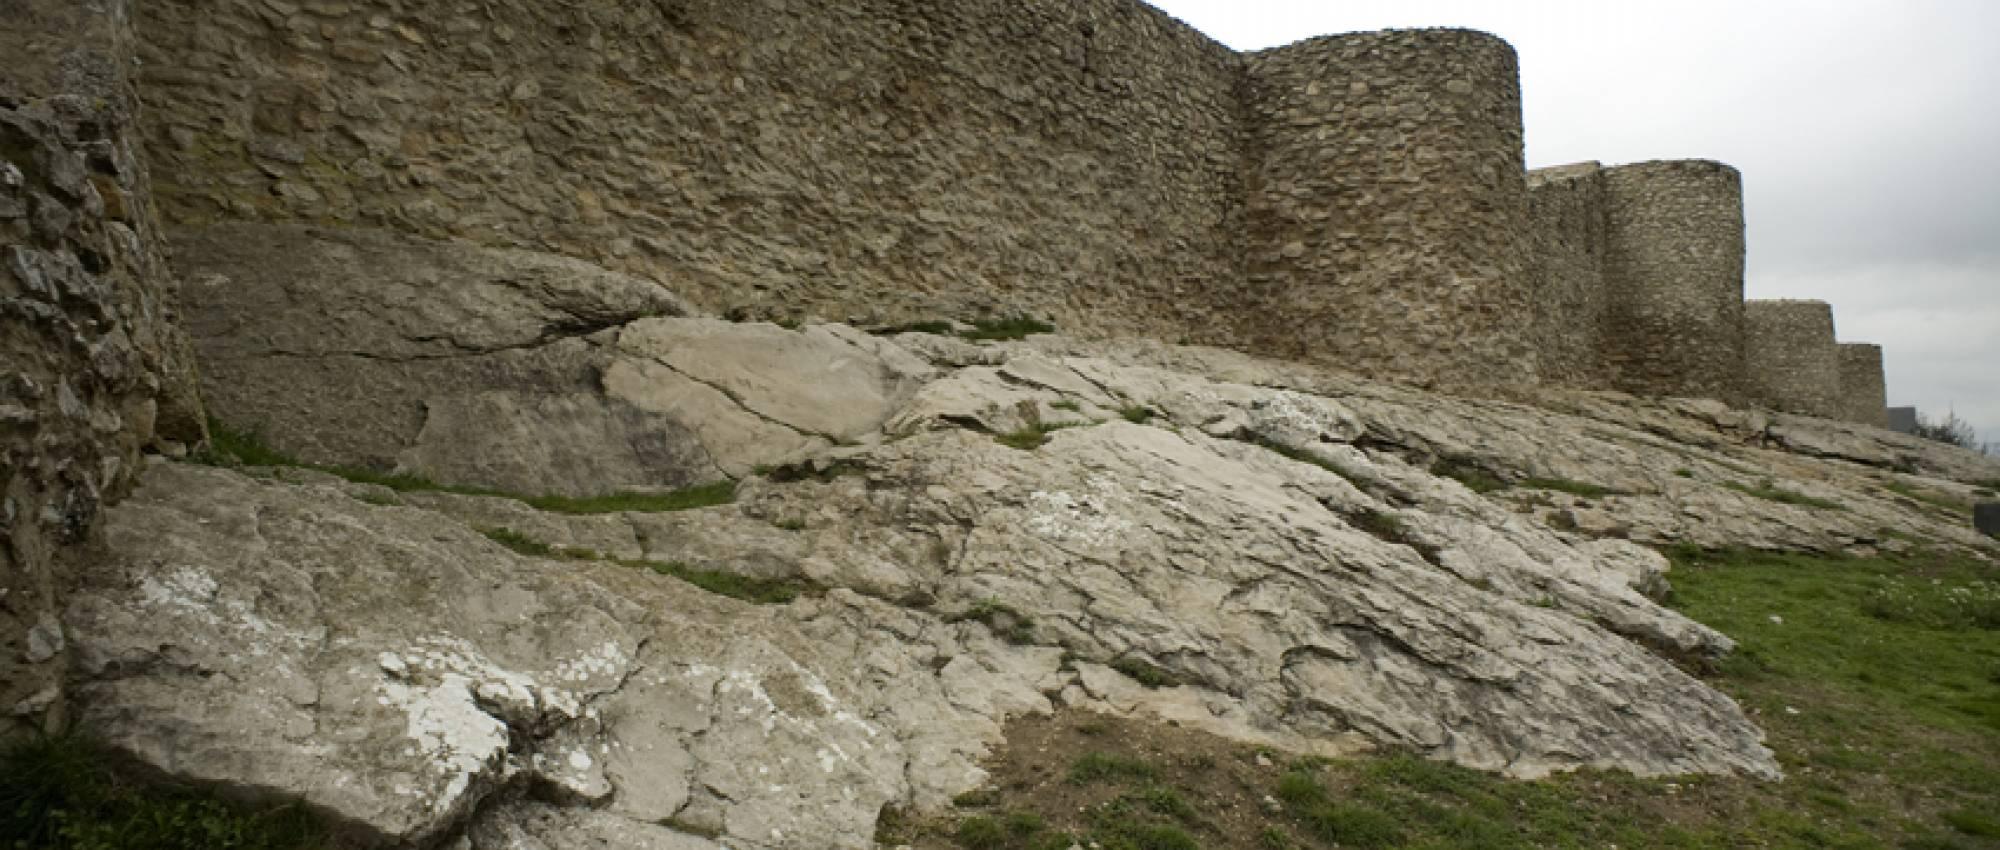 Vista dels murs del castell. PMRMaeyaert / Wikimedia Commons. CC BY-SA 3.0 es